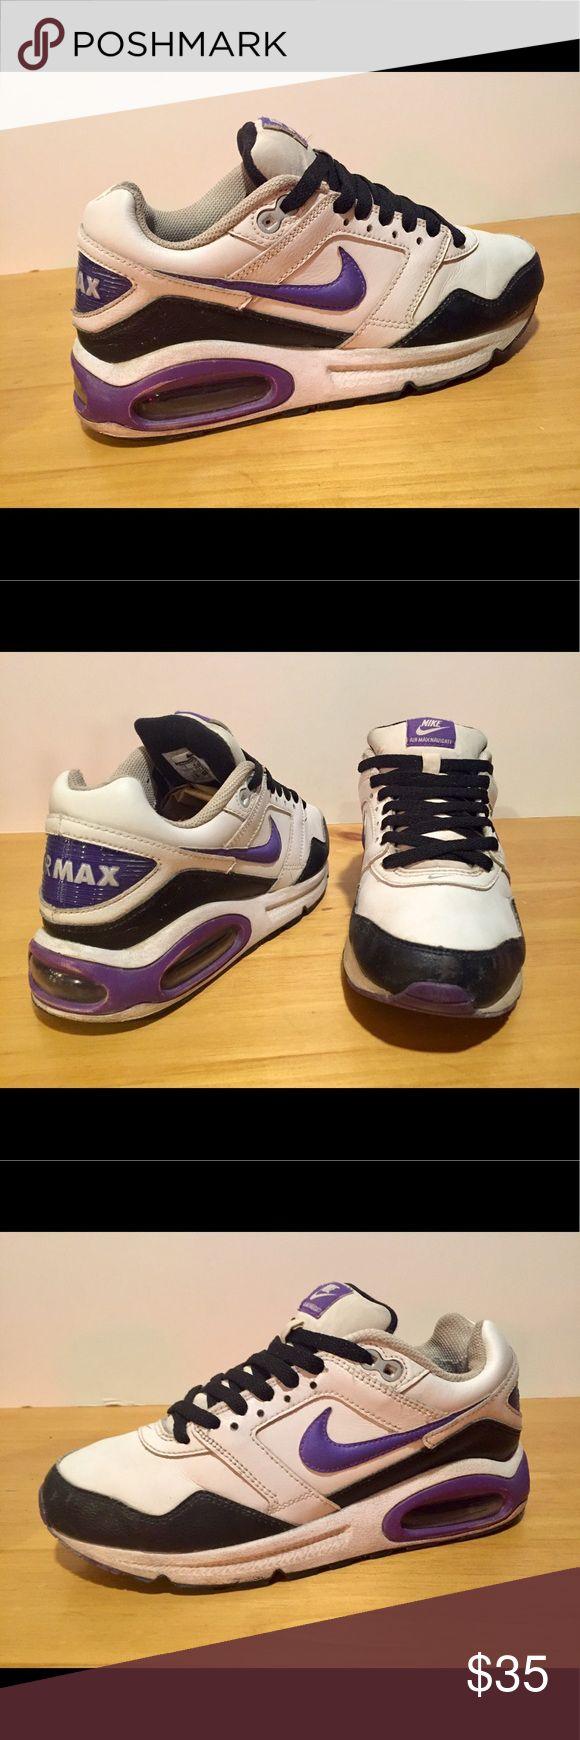 Women's Nike Air Max Shoes Women's Nike Air Max Shoes - Size 7 - Black,